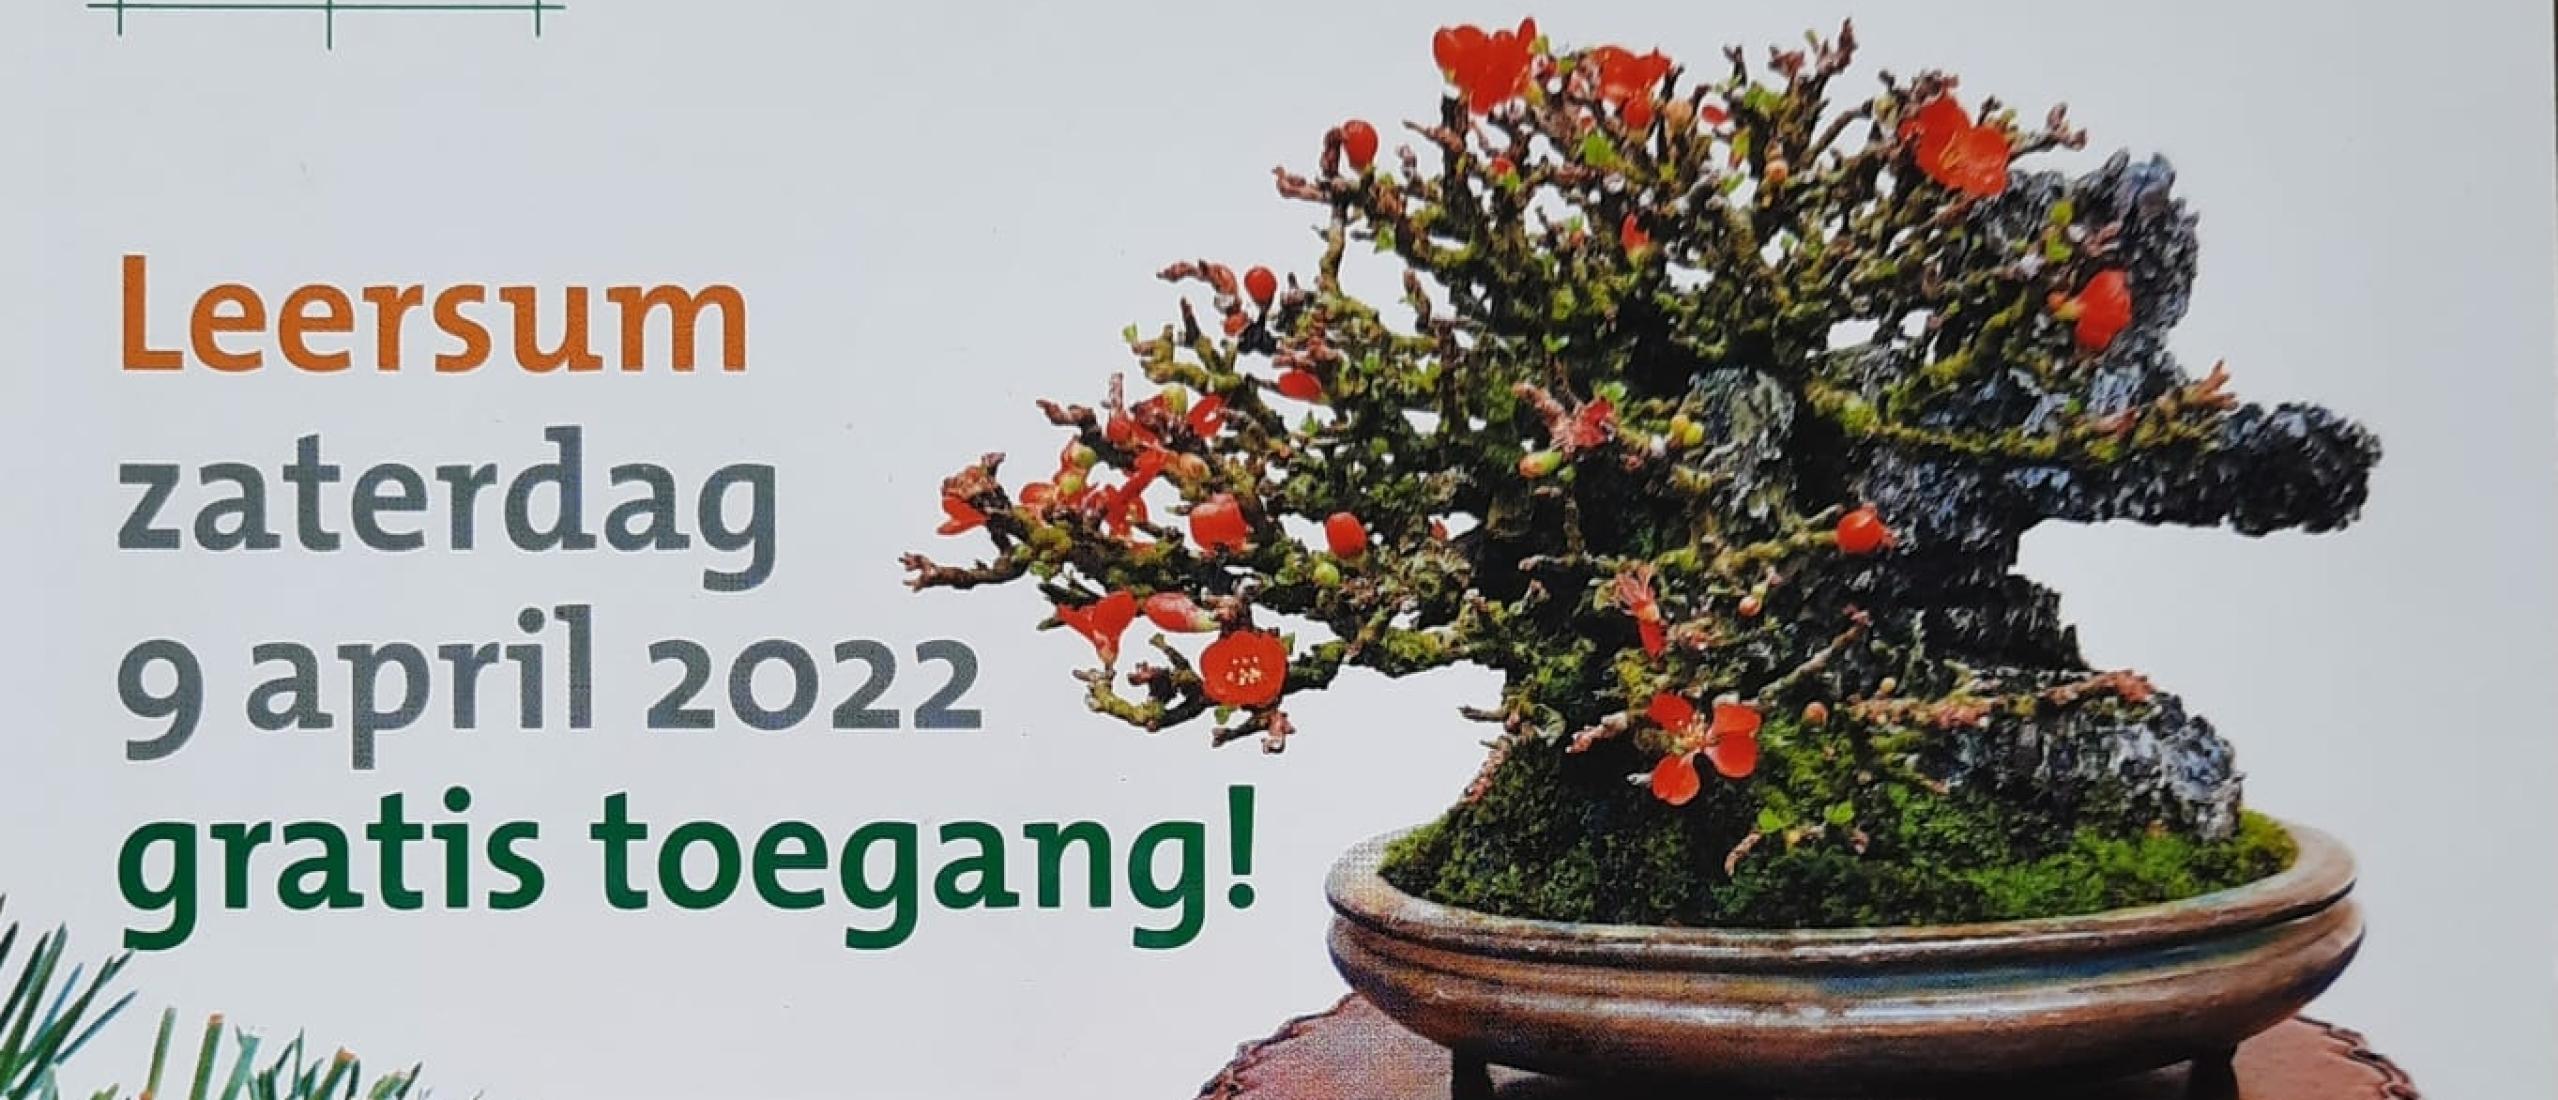 Bonsai show simultaan demo 9 april 2022